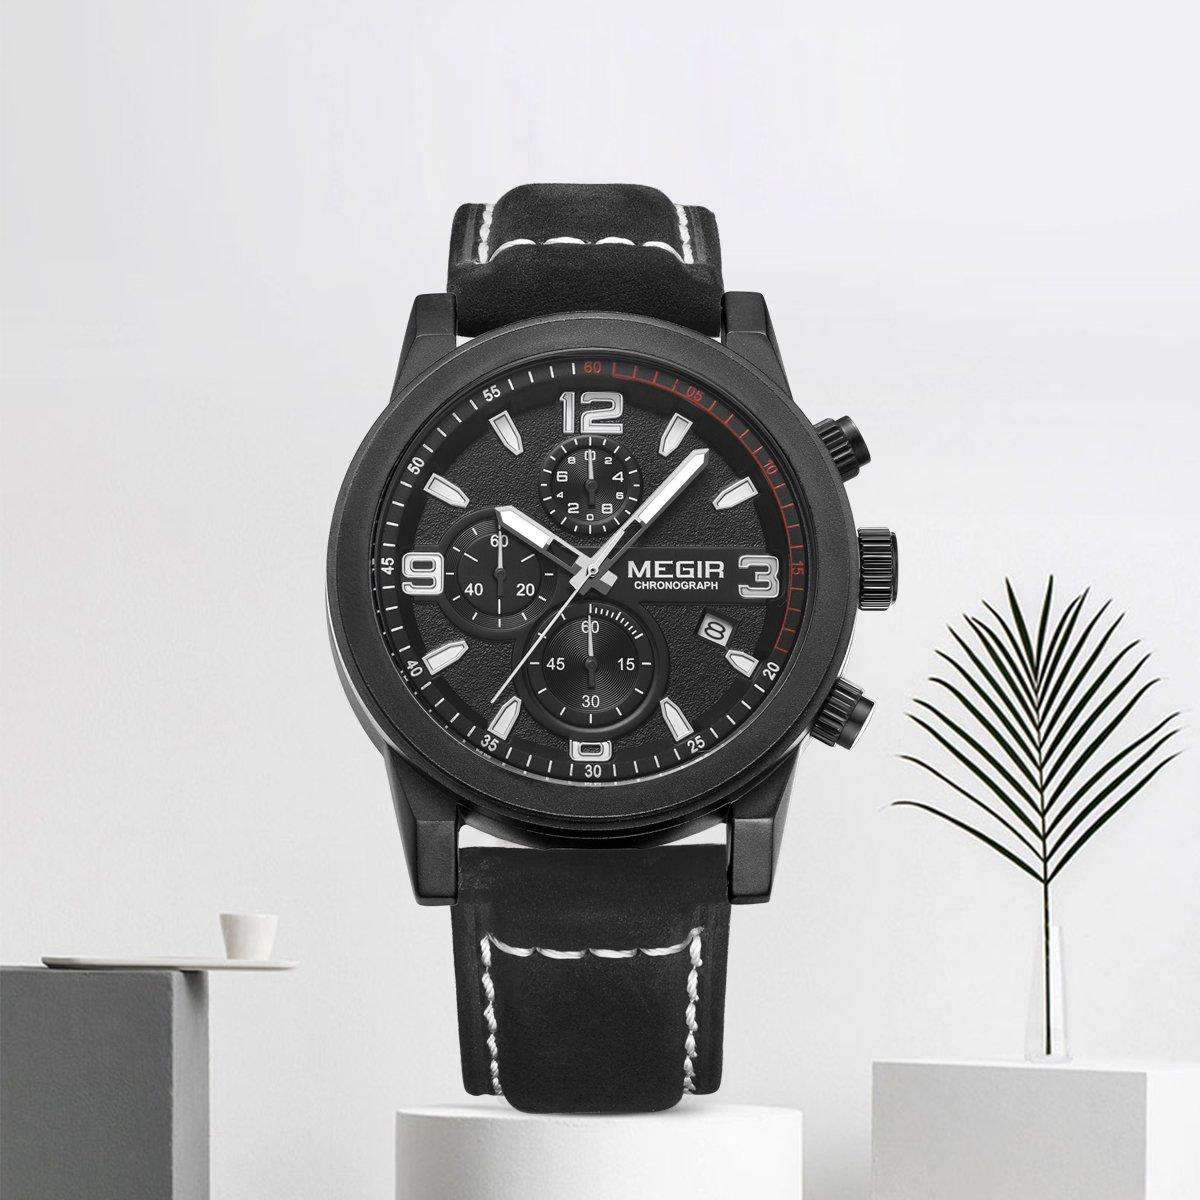 Amazon.com: MEGIR Men Work Wrist Watch Quartz Analog Waterproof Chronograph Business Watch with Leather Band Luminous Hands: Watches